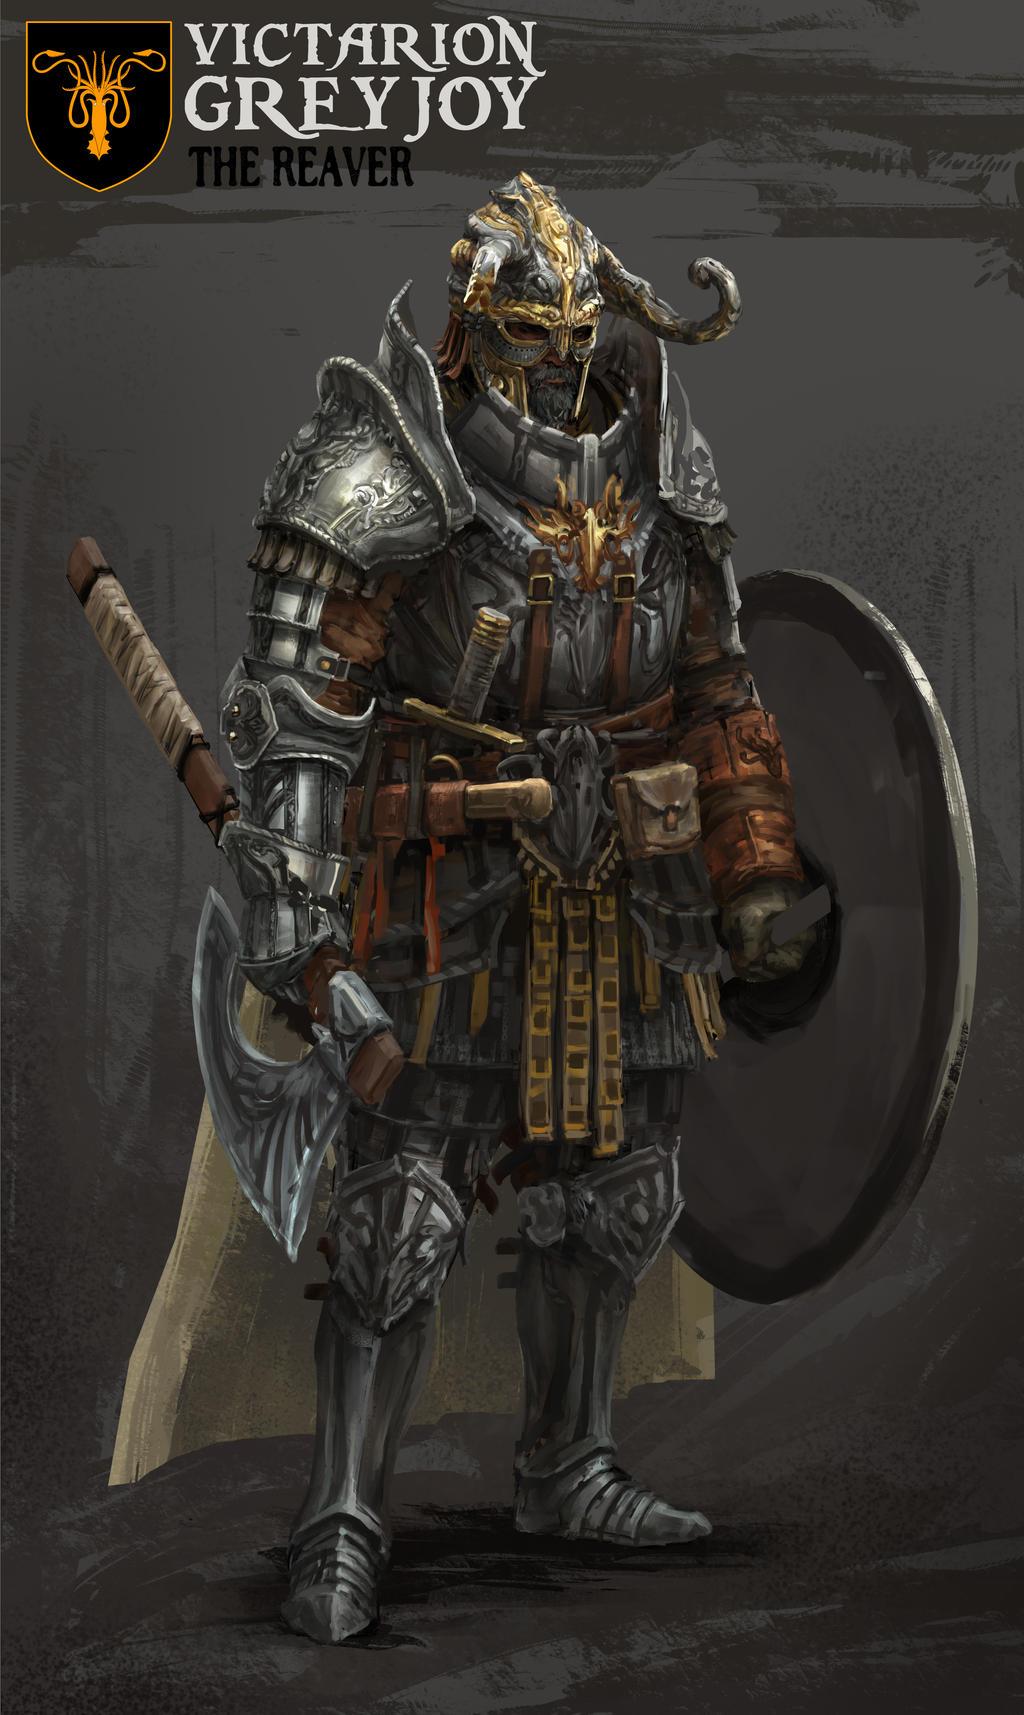 Image - Plate Armor.jpg | Ra Va's D&D Wiki | FANDOM ... |Victarion Greyjoy Helm